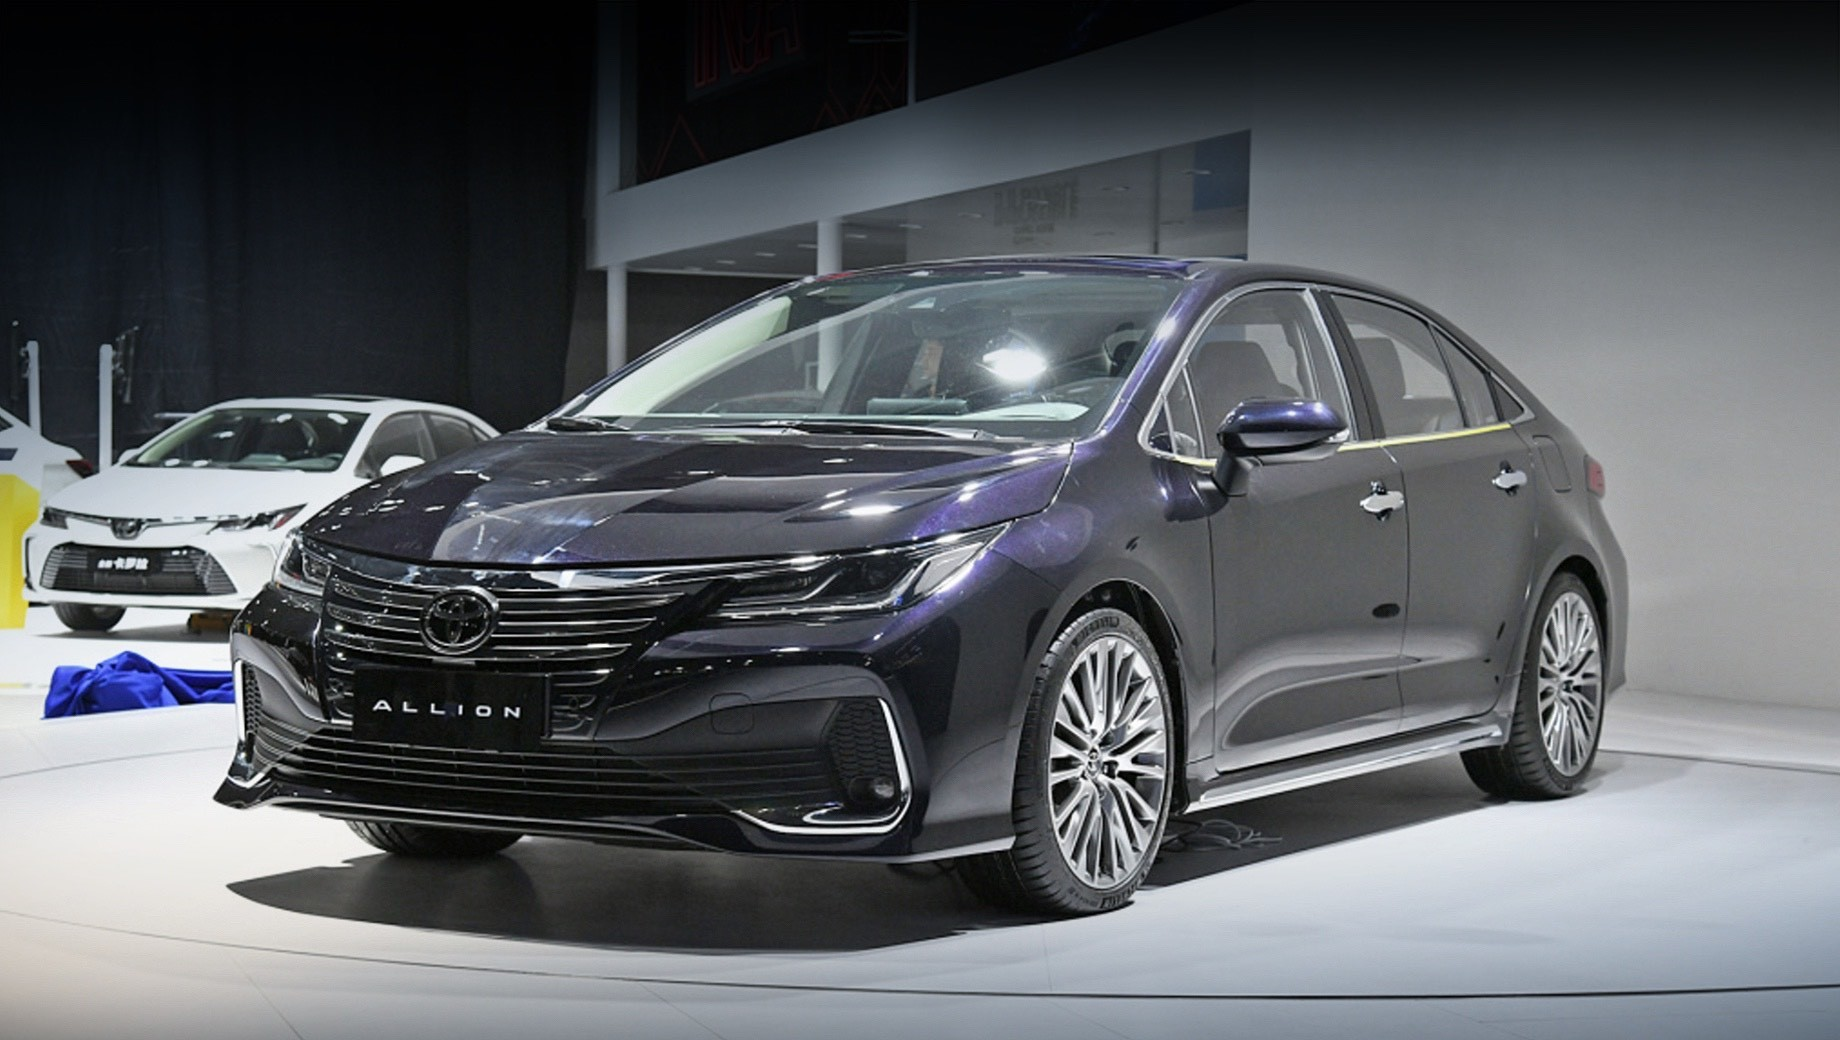 Toyota Allion превратилась в топ-версию Короллы